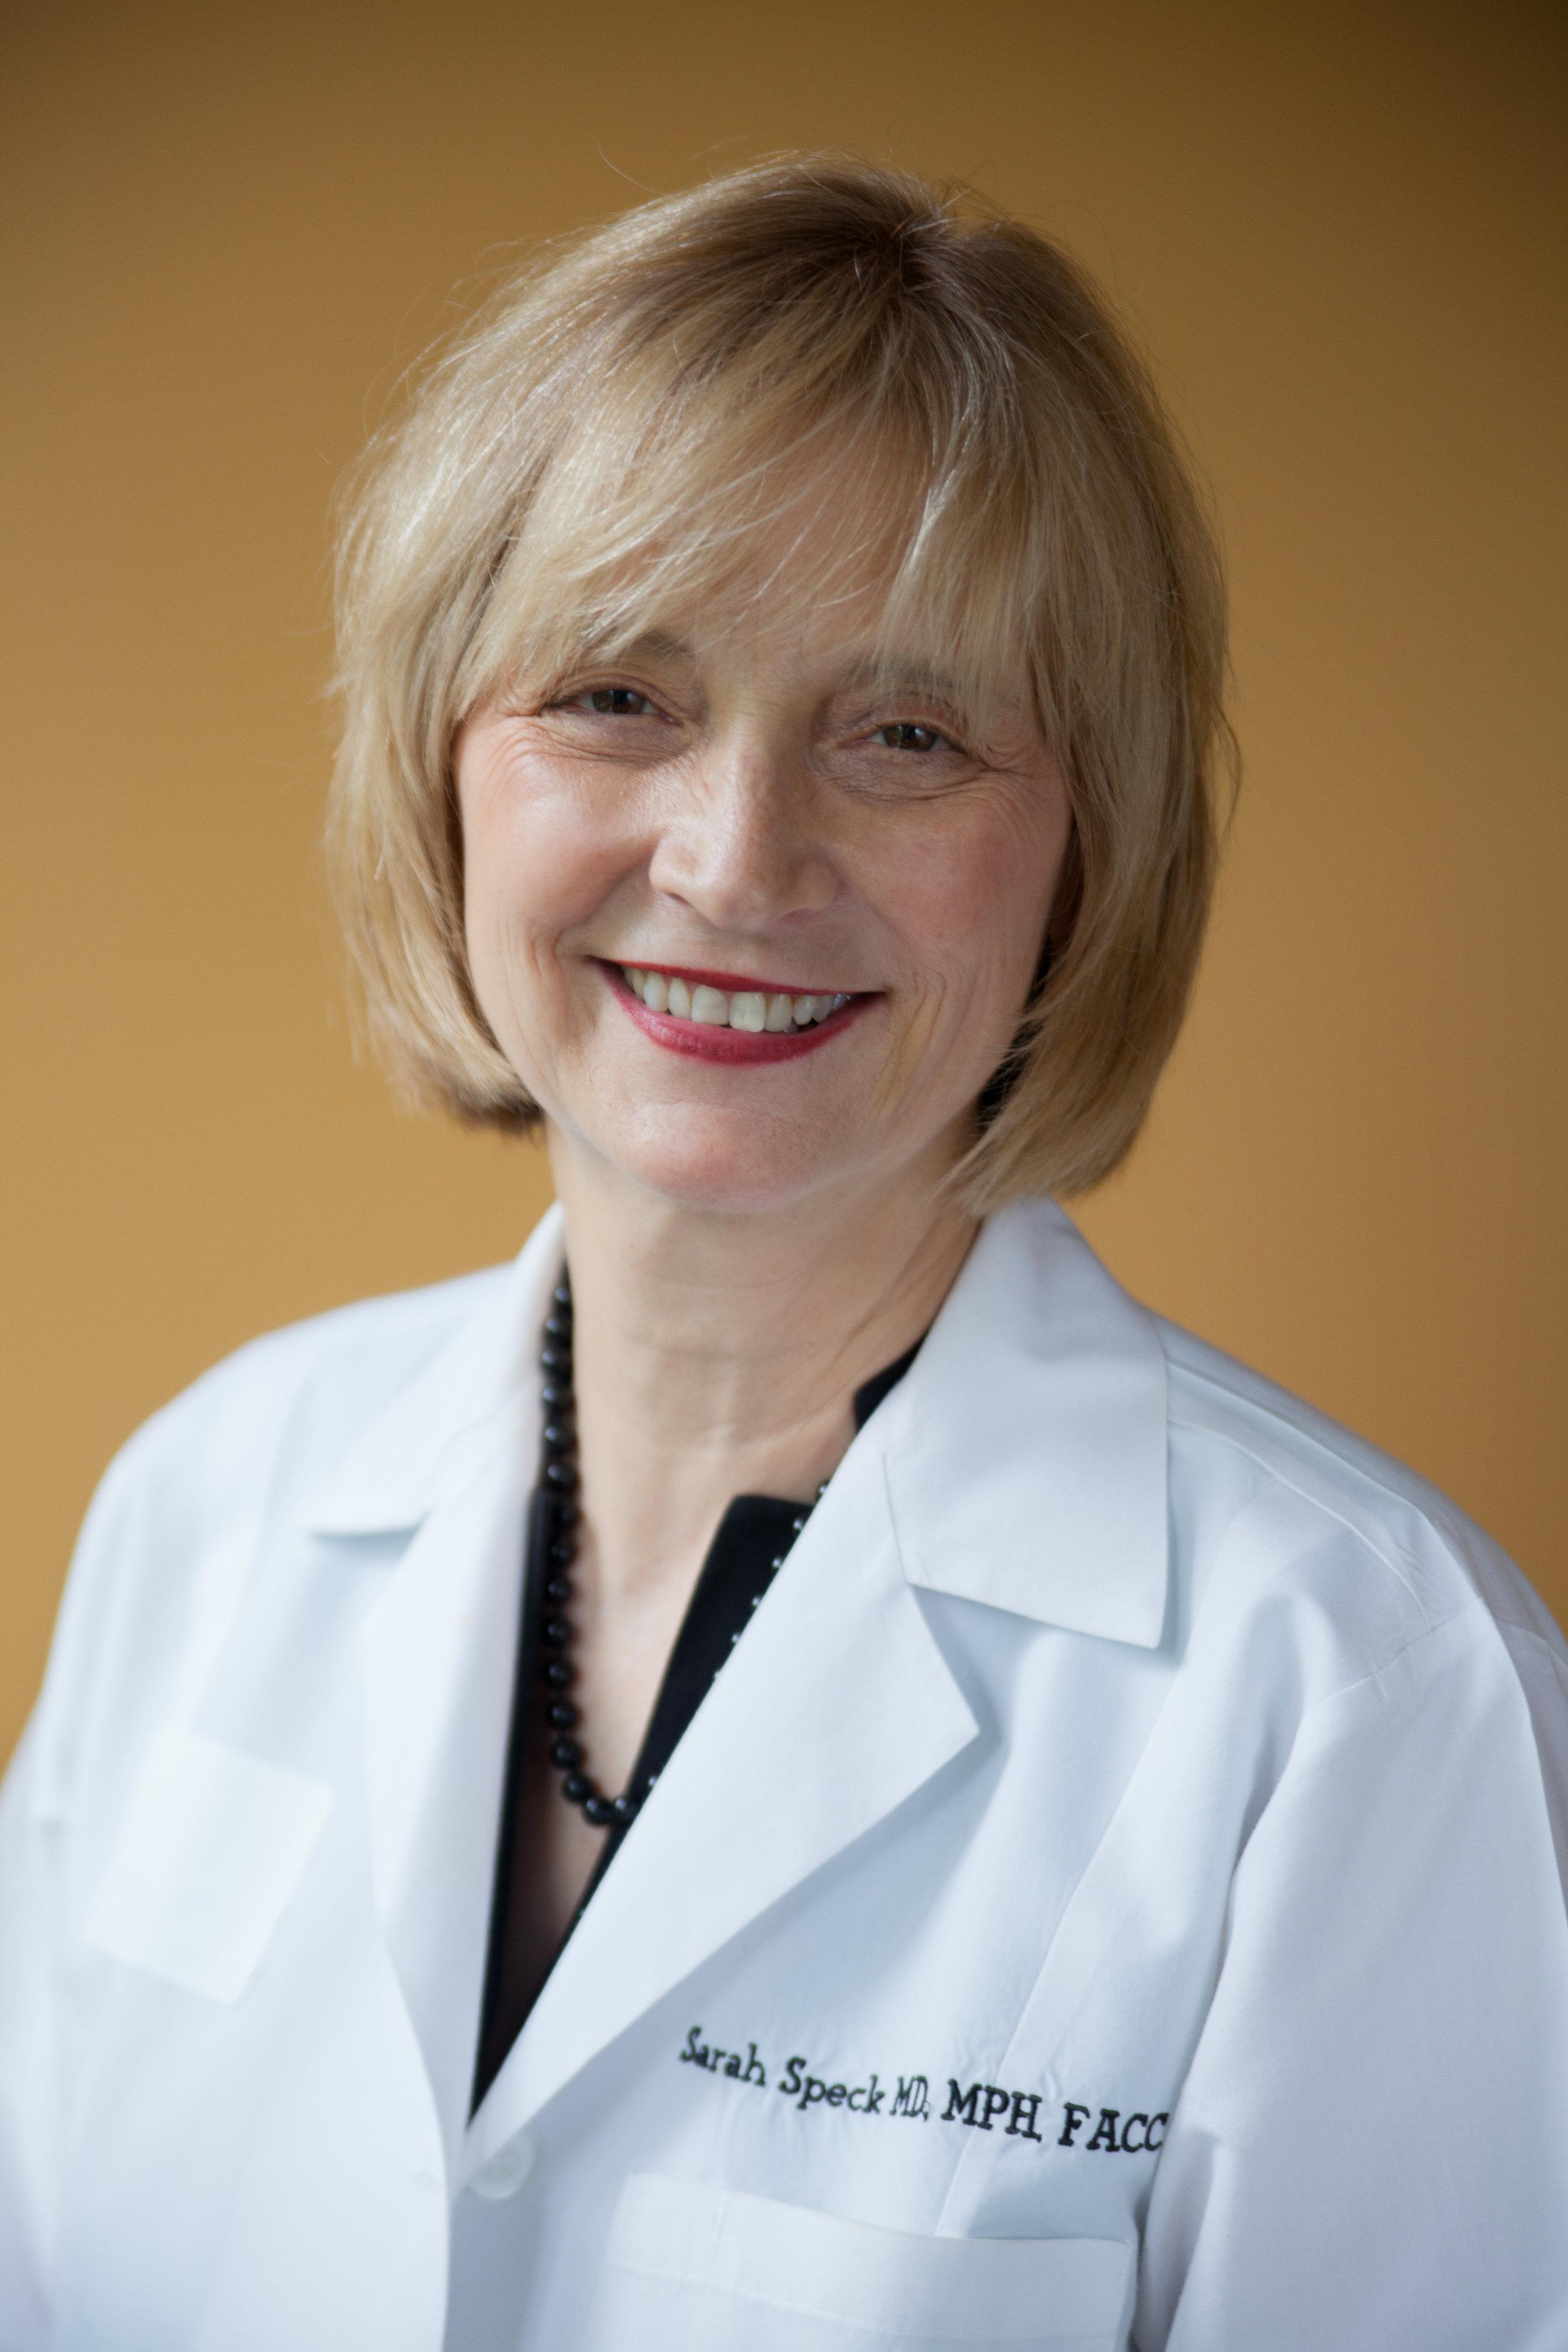 Dr. Speck Headshot 2.jpg